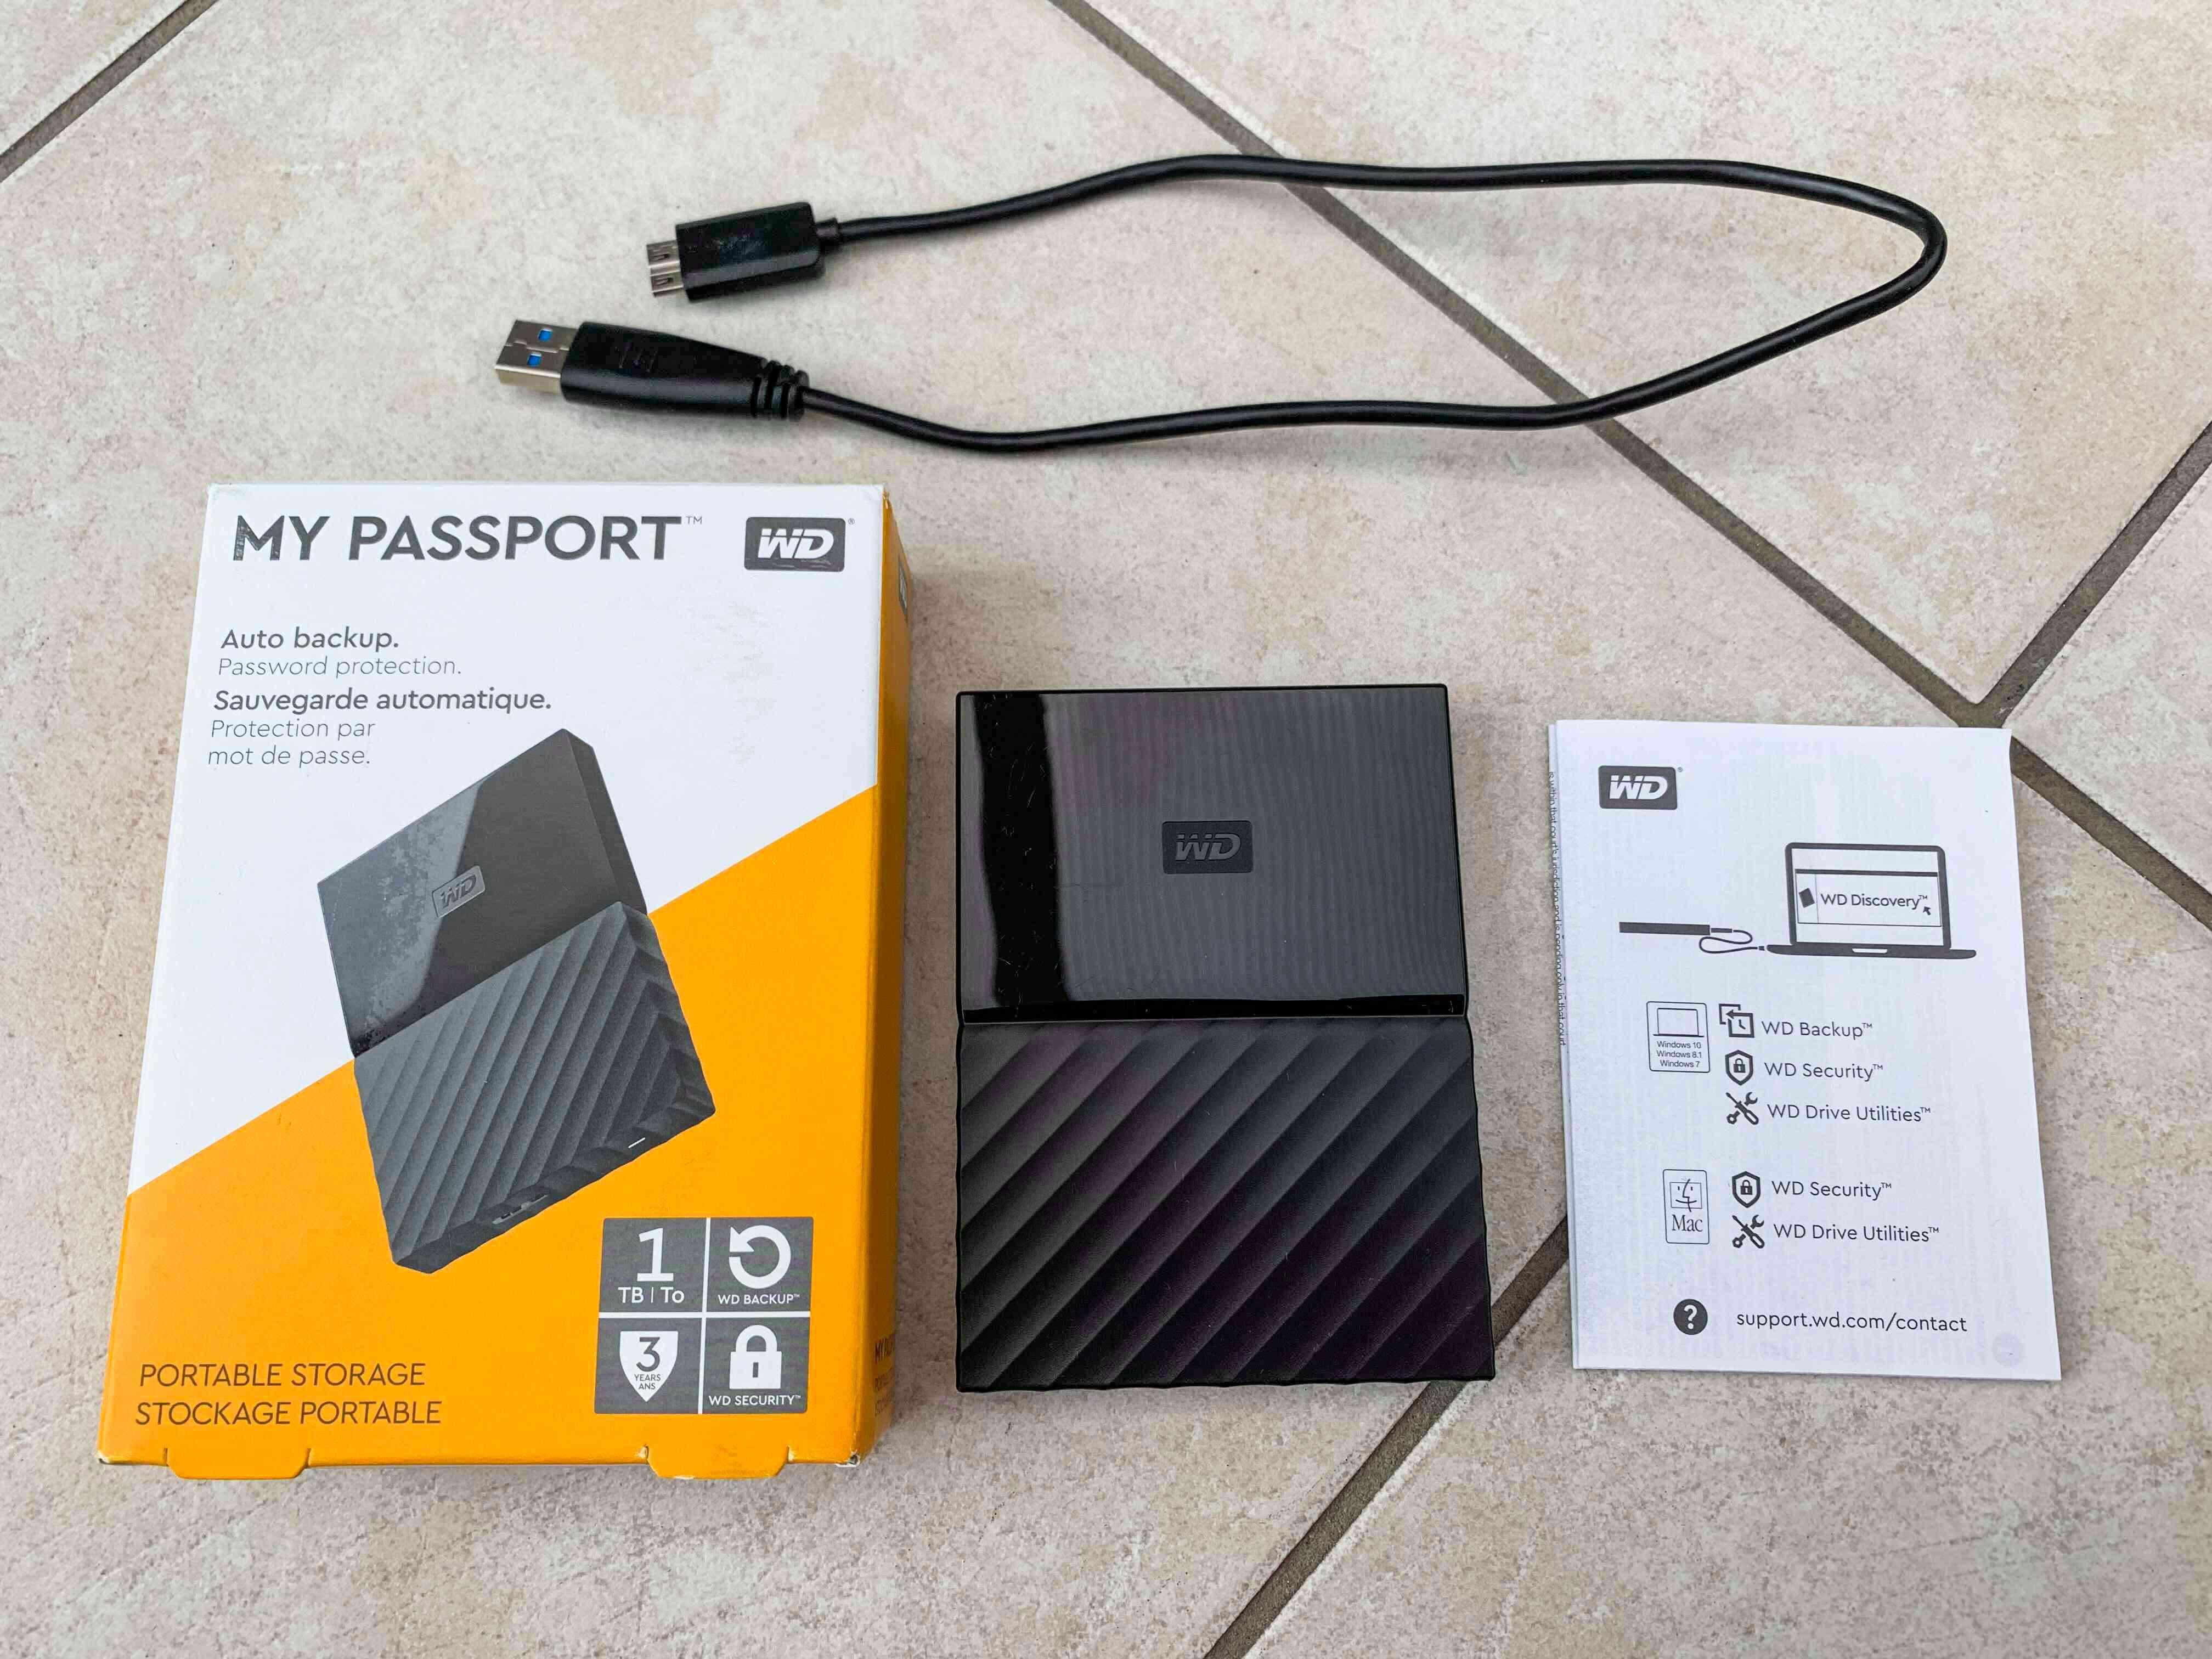 WD 1TB My Passport